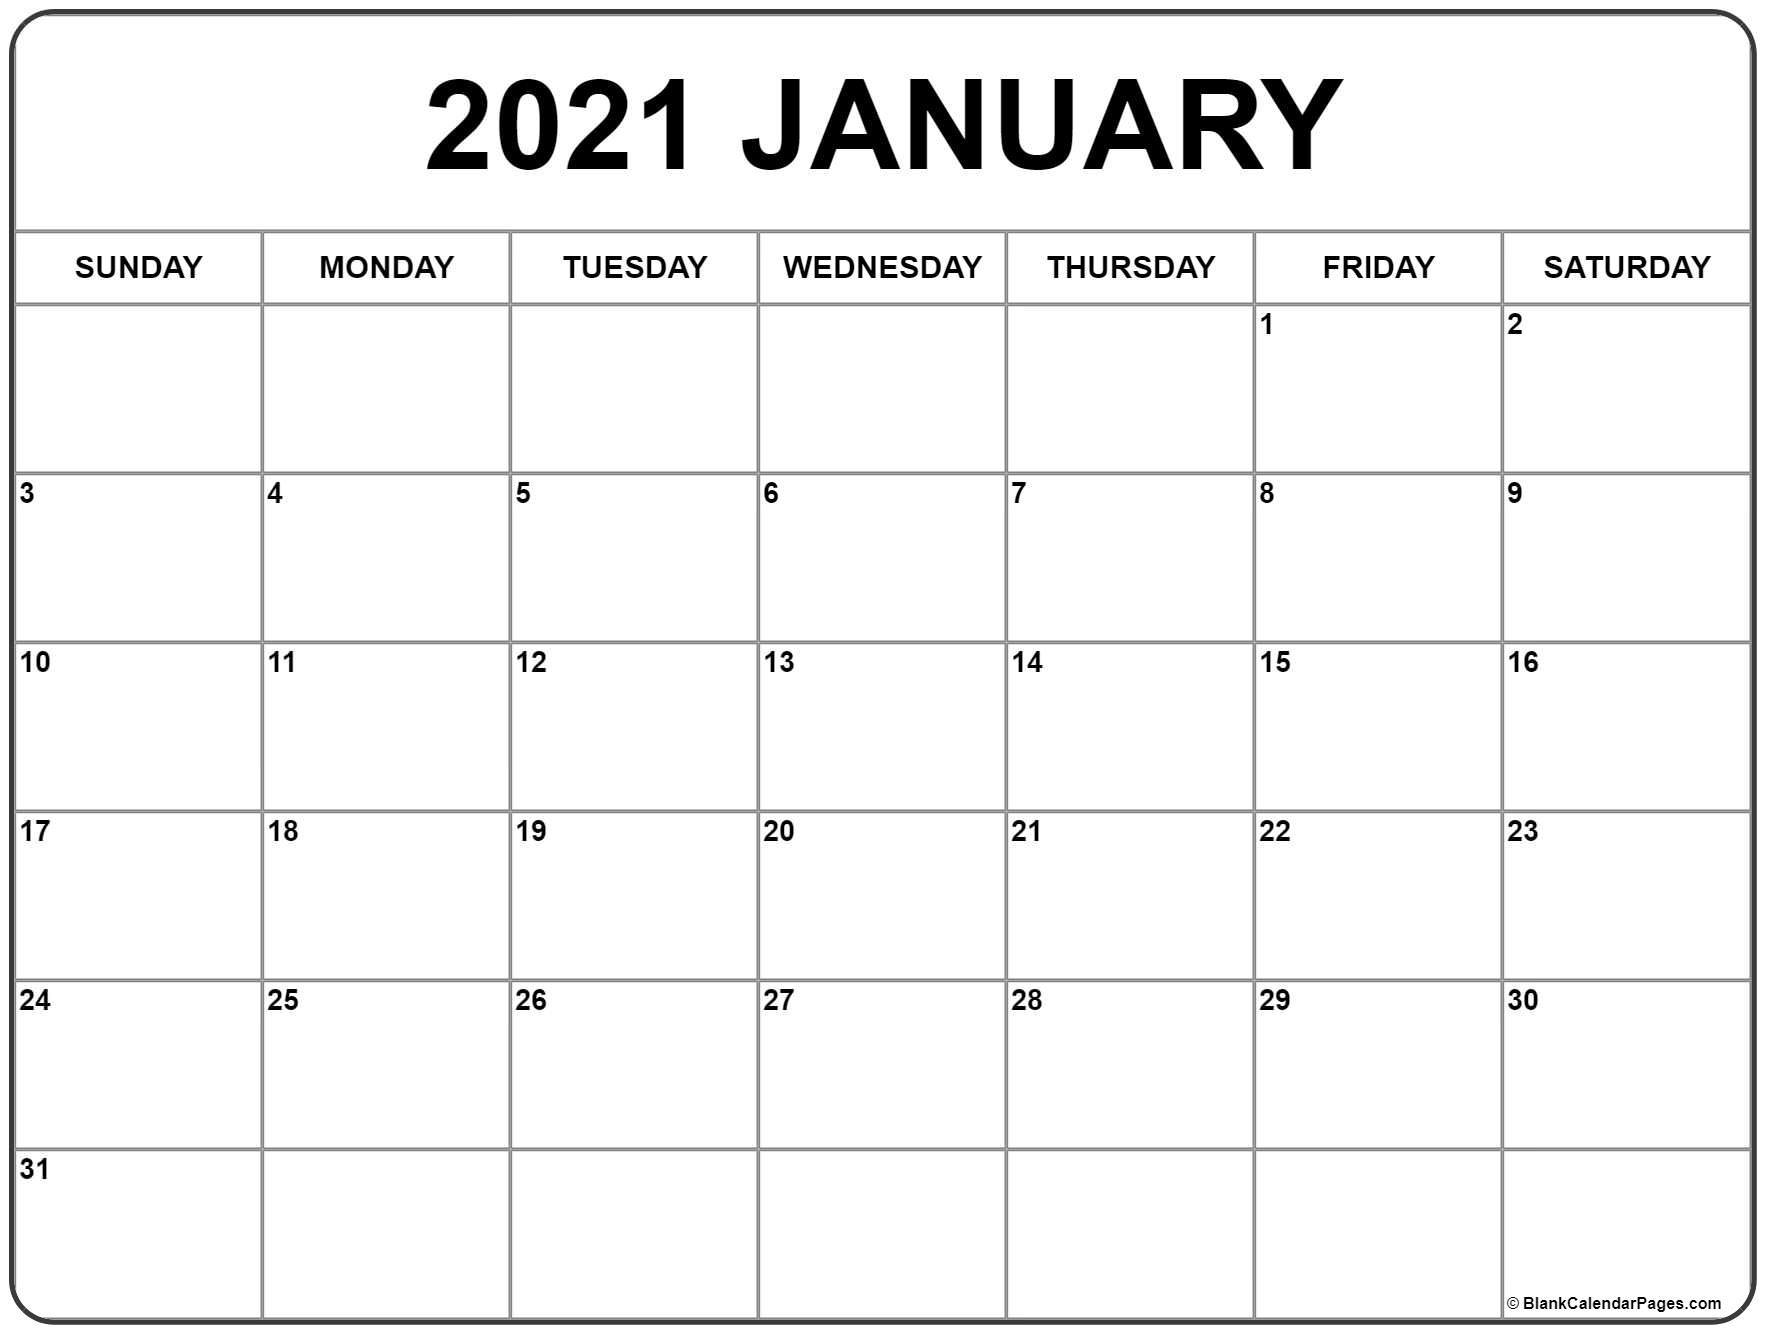 January 2021 Calendar | Free Printable Monthly Calendars-2021 Calendar Printable